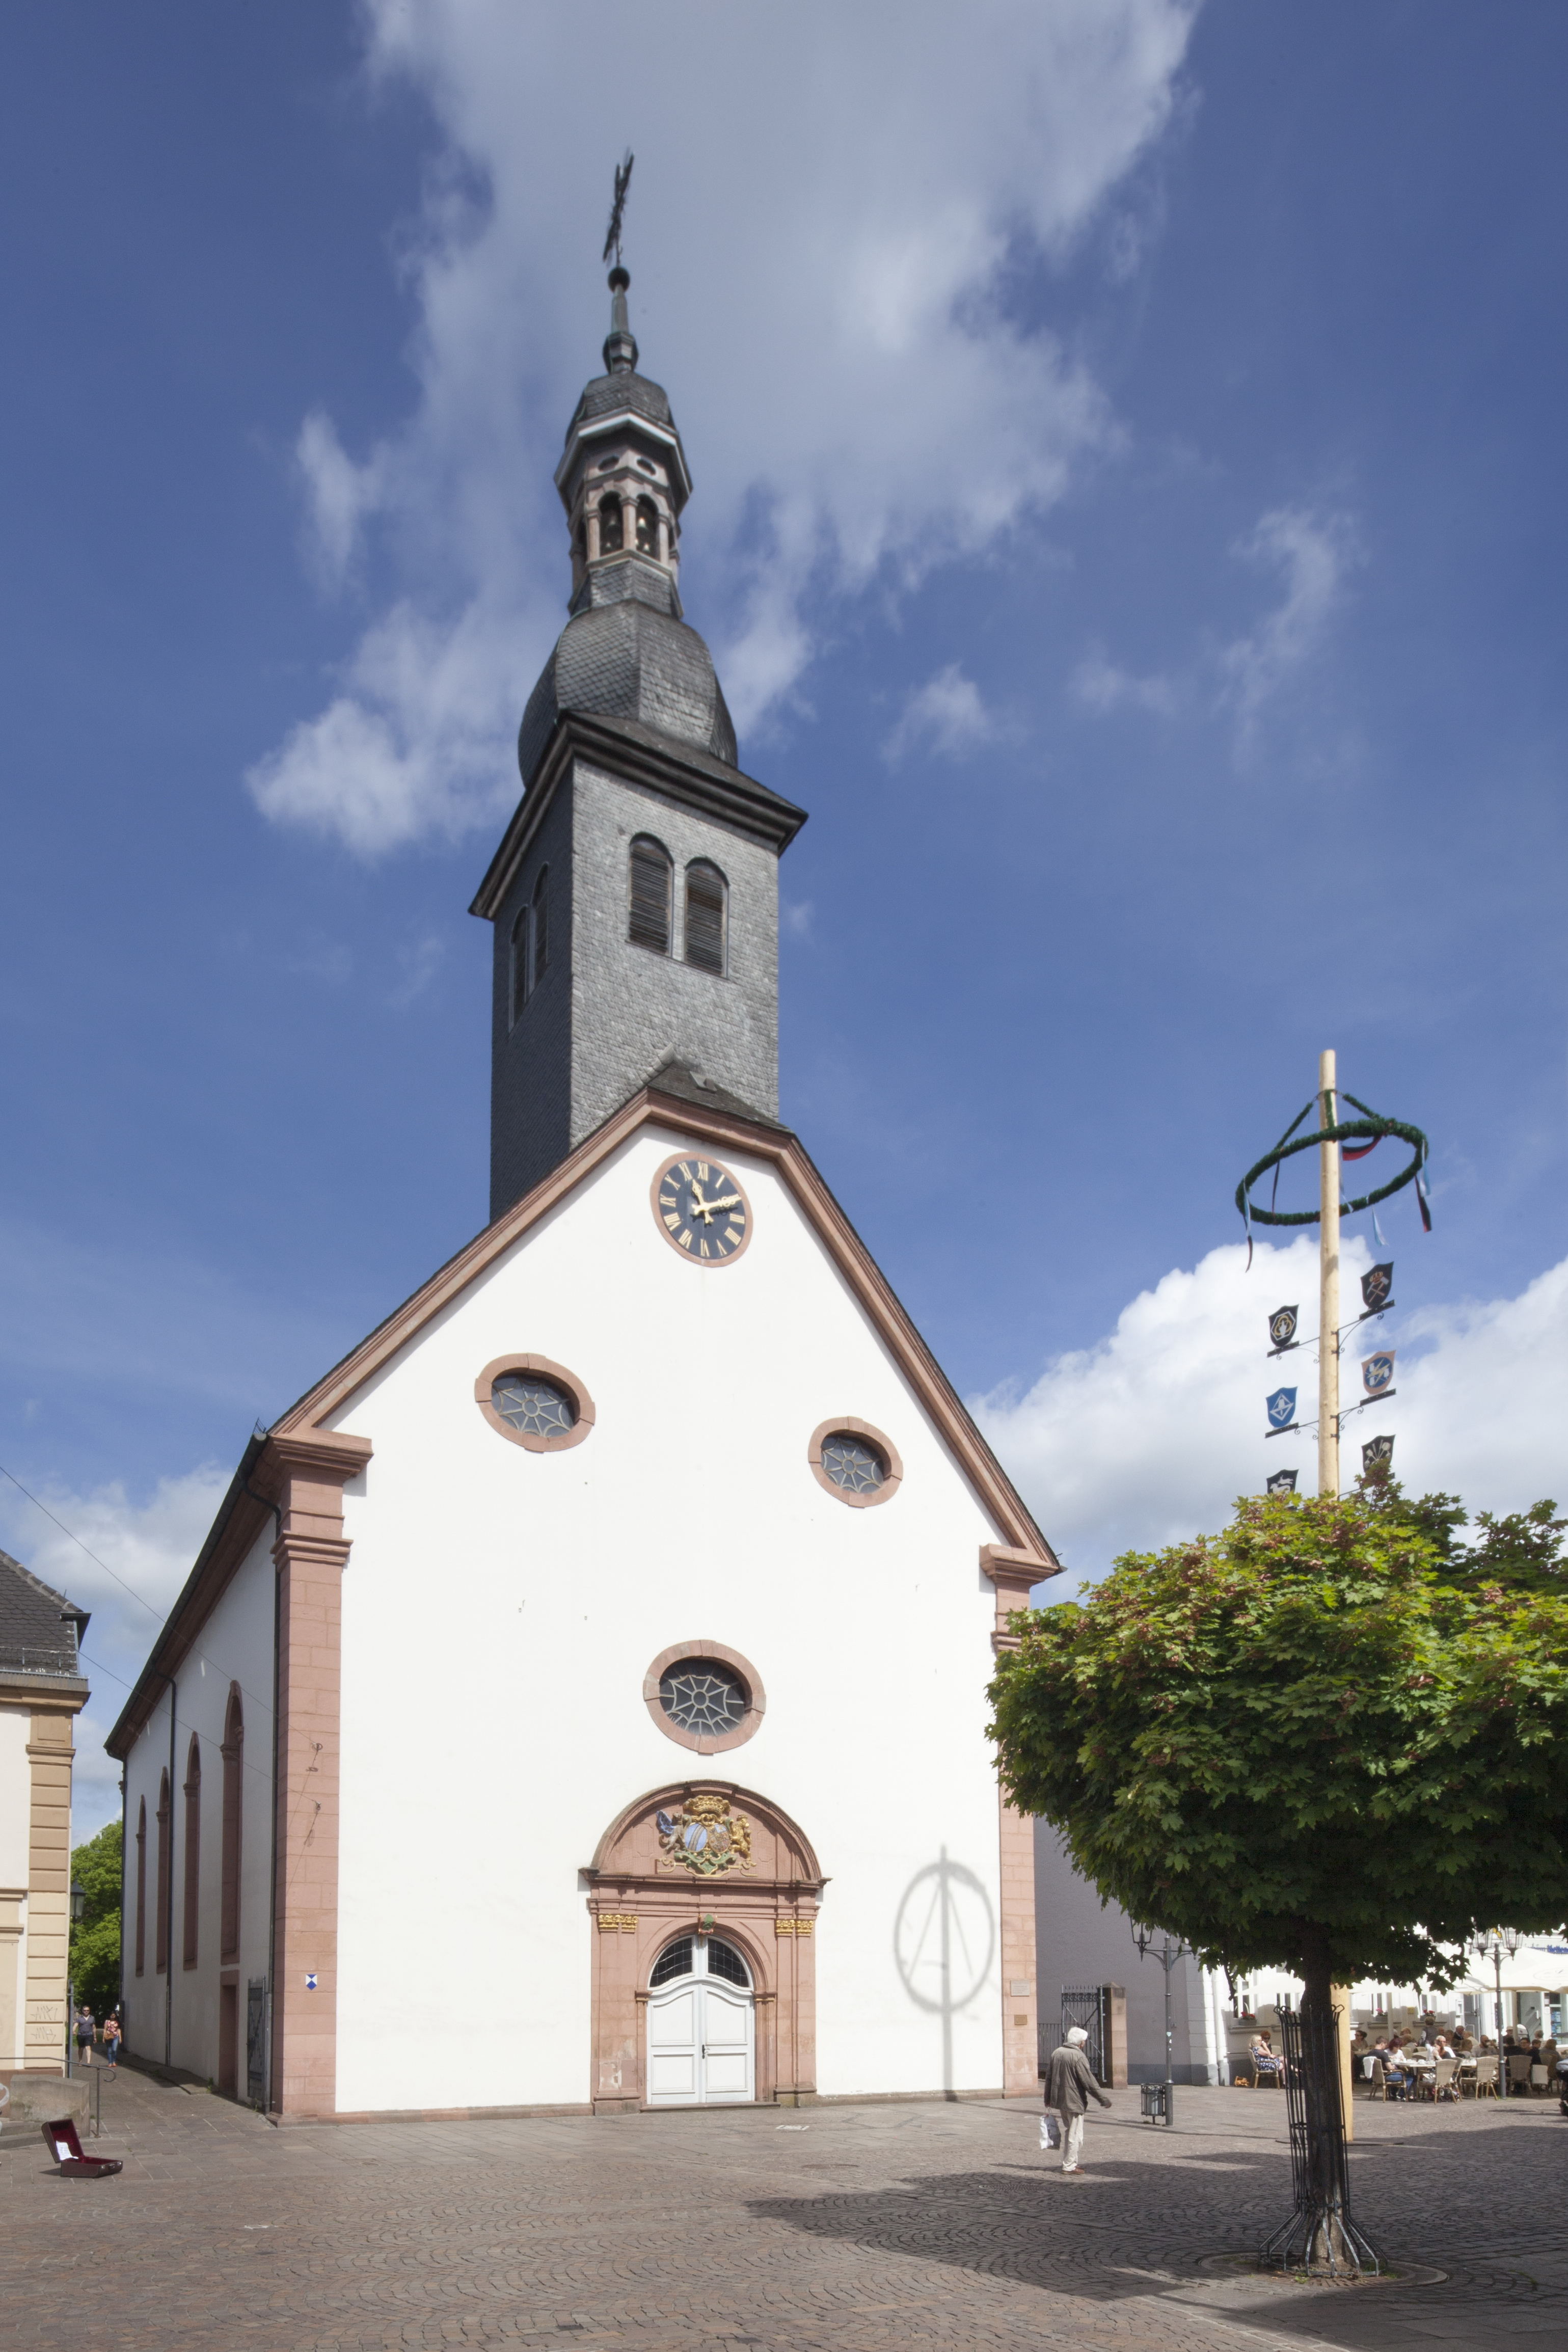 Engelbertskirche St. Ingbert